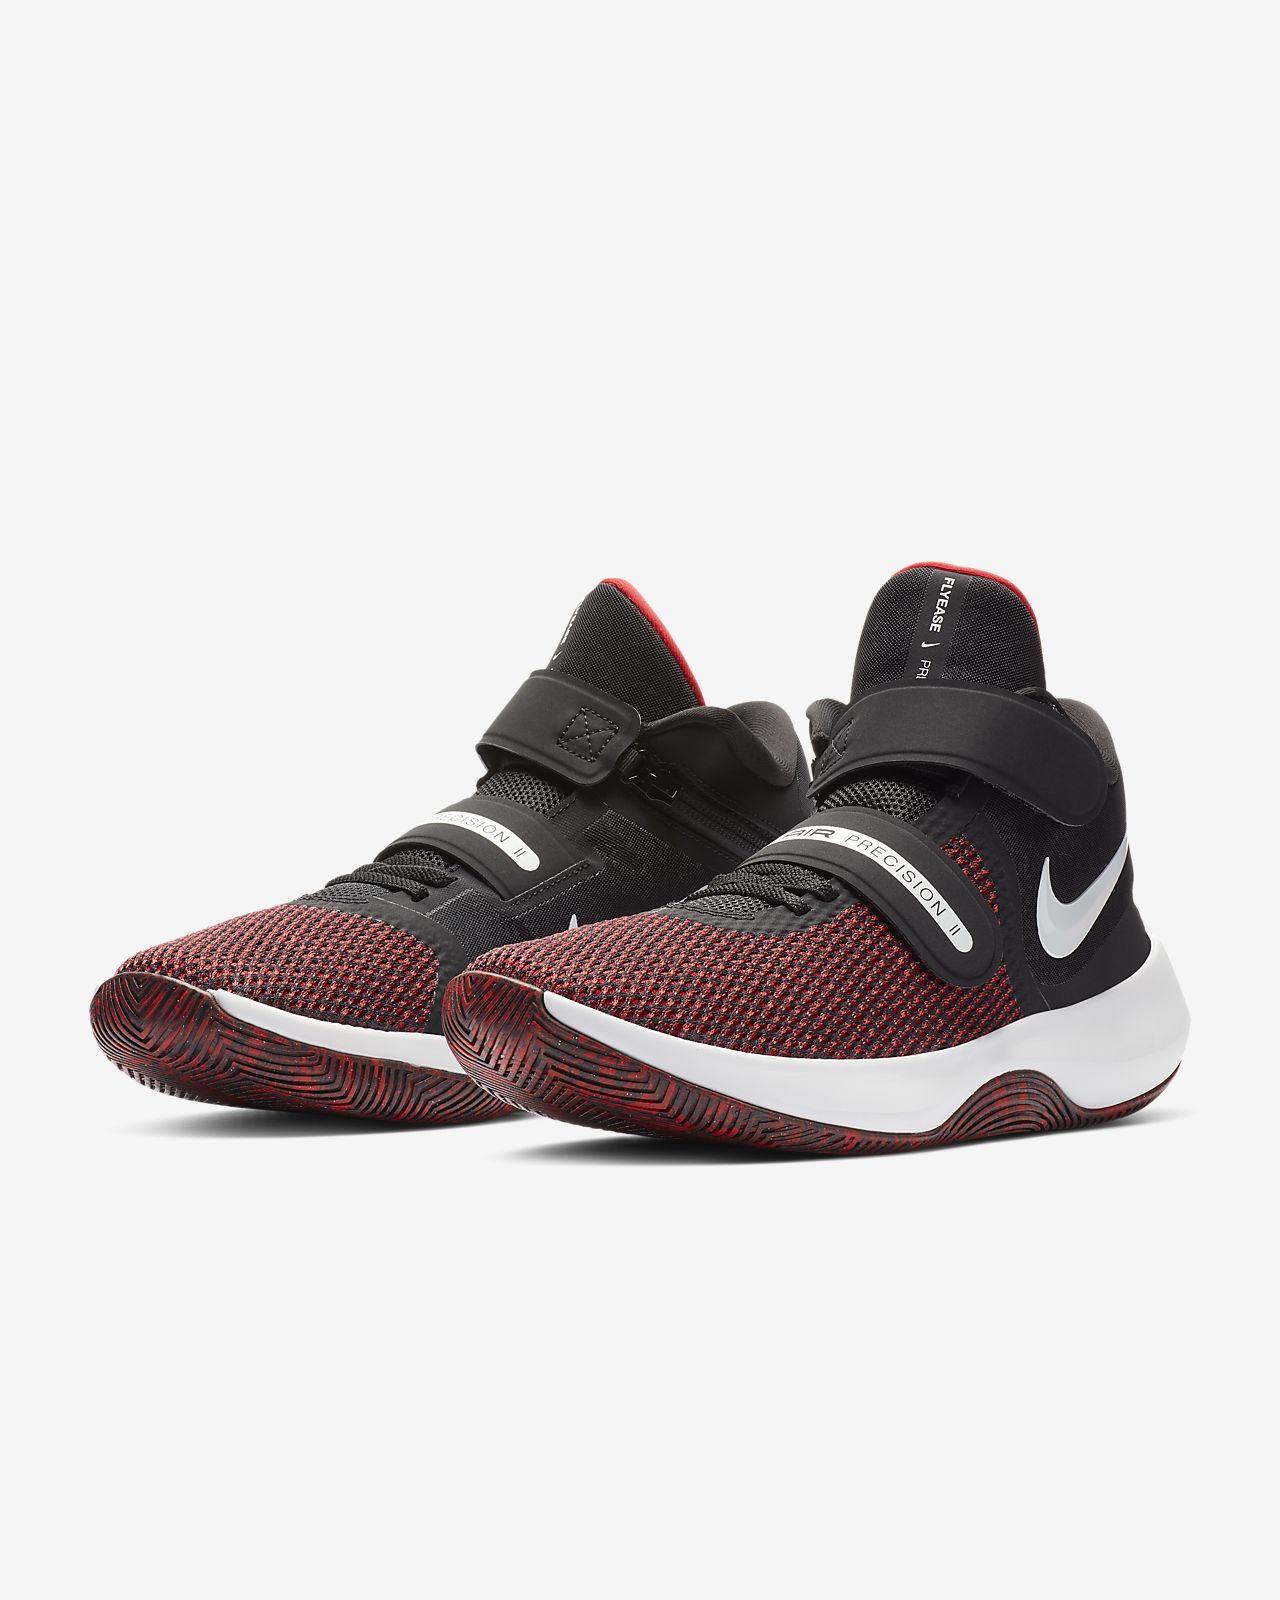 436cb7a7c456 Nike Air Precision II FlyEase Men s Basketball Shoe. Nike.com